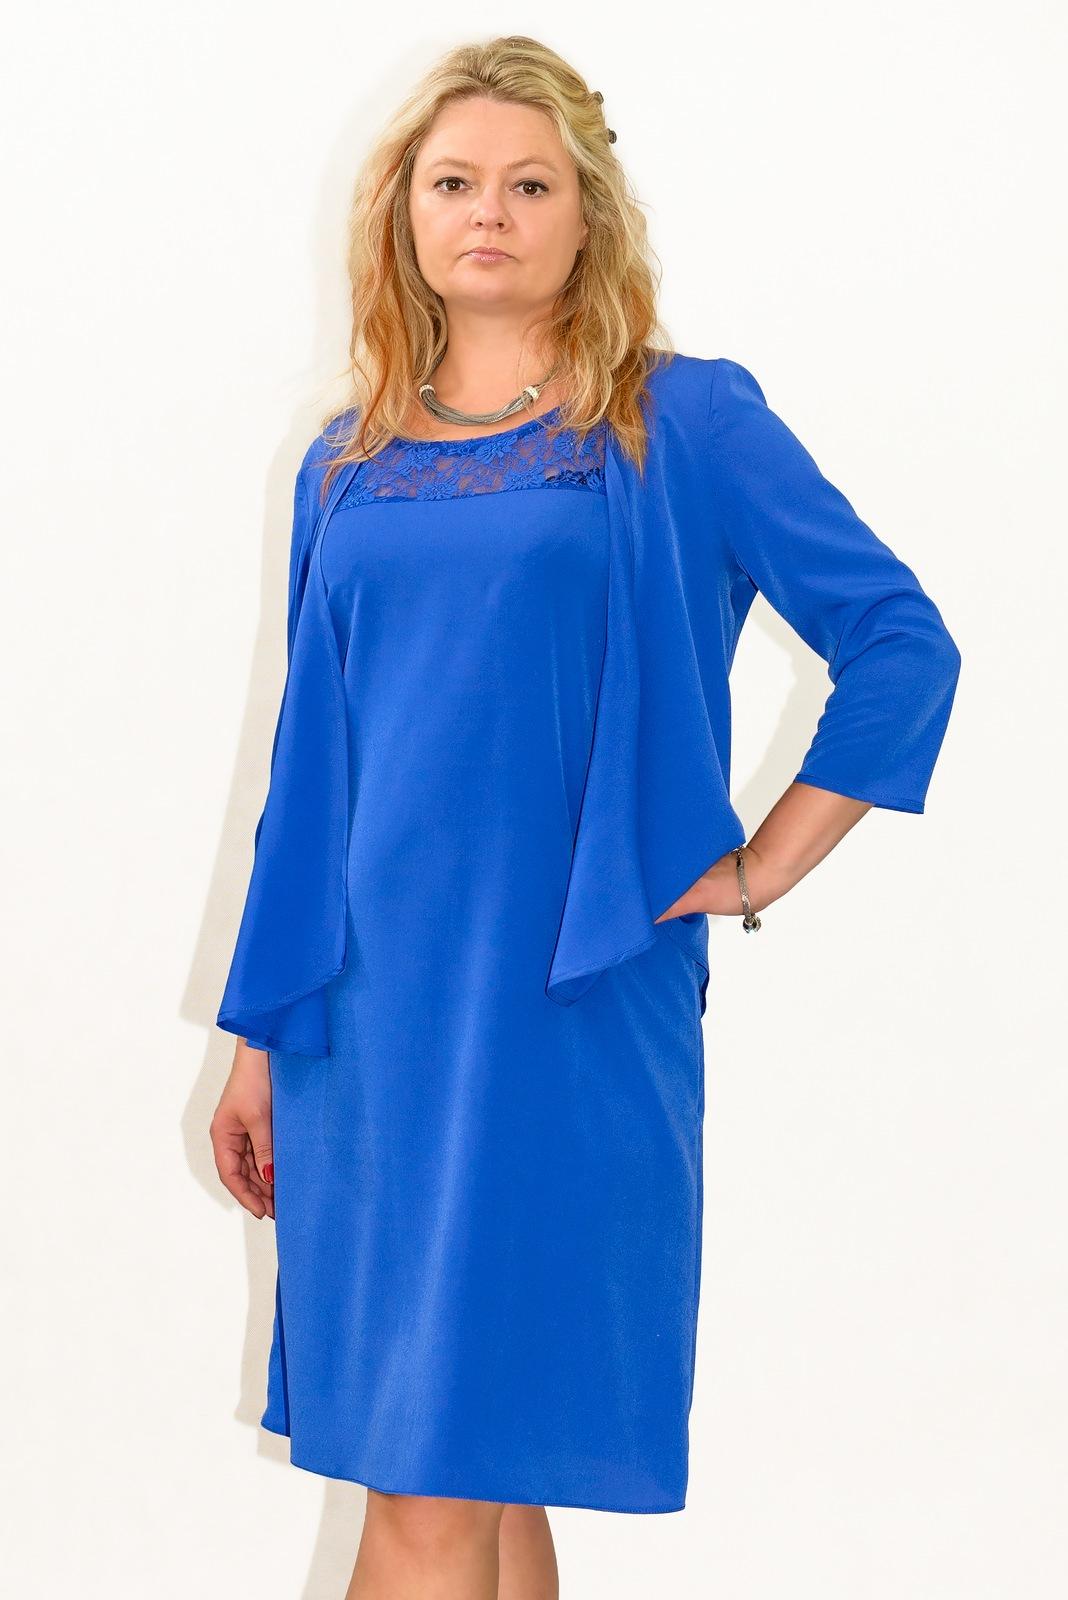 545d23bf28 Sukienka plus size r. 52 wesele